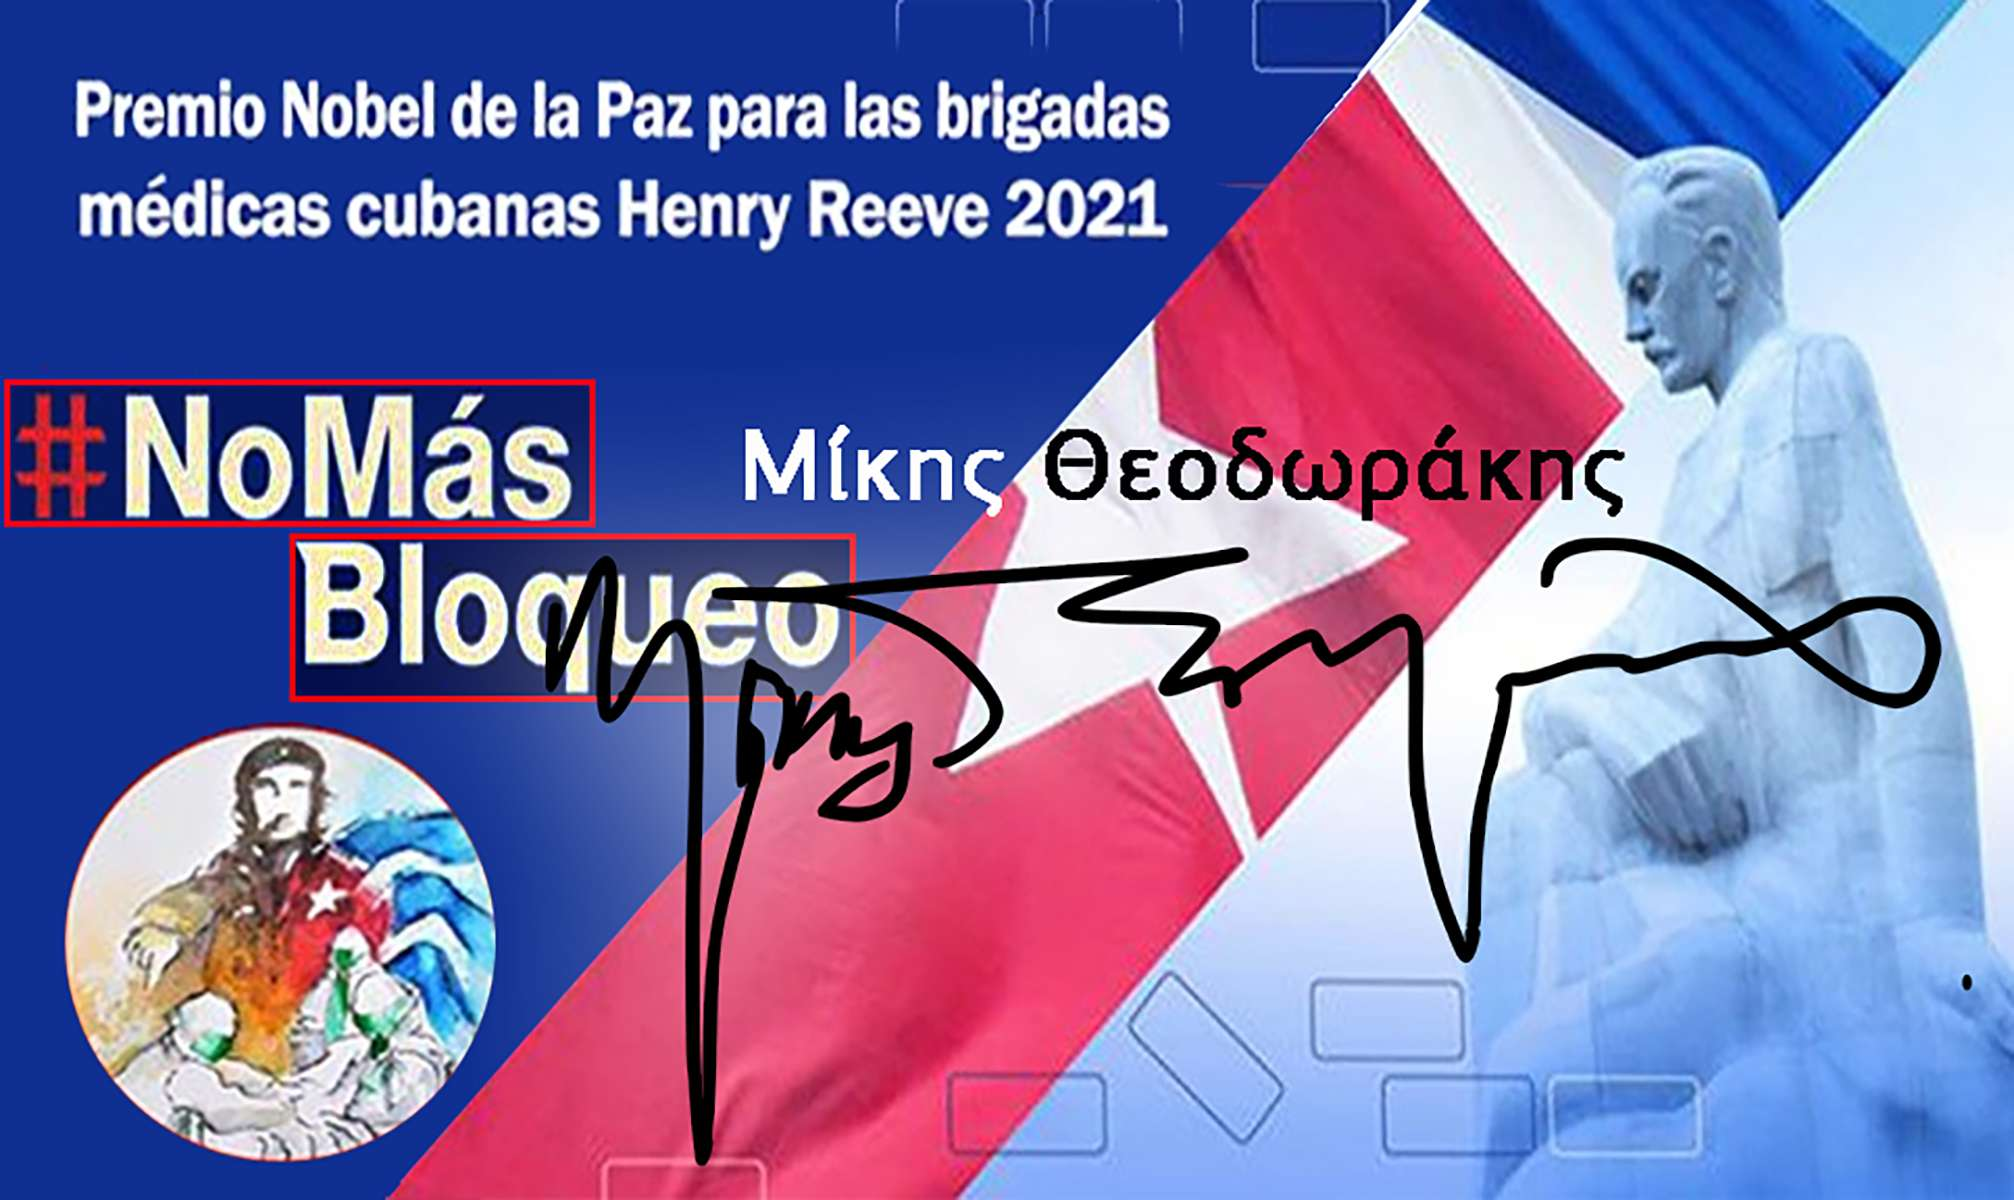 Mikis Theodorakis Μίκης Θεοδωράκης Νόμπελ Ειρήνης Henry Reeve Premio Nobel de la Paz para las brigadas médicas cubanas 2021